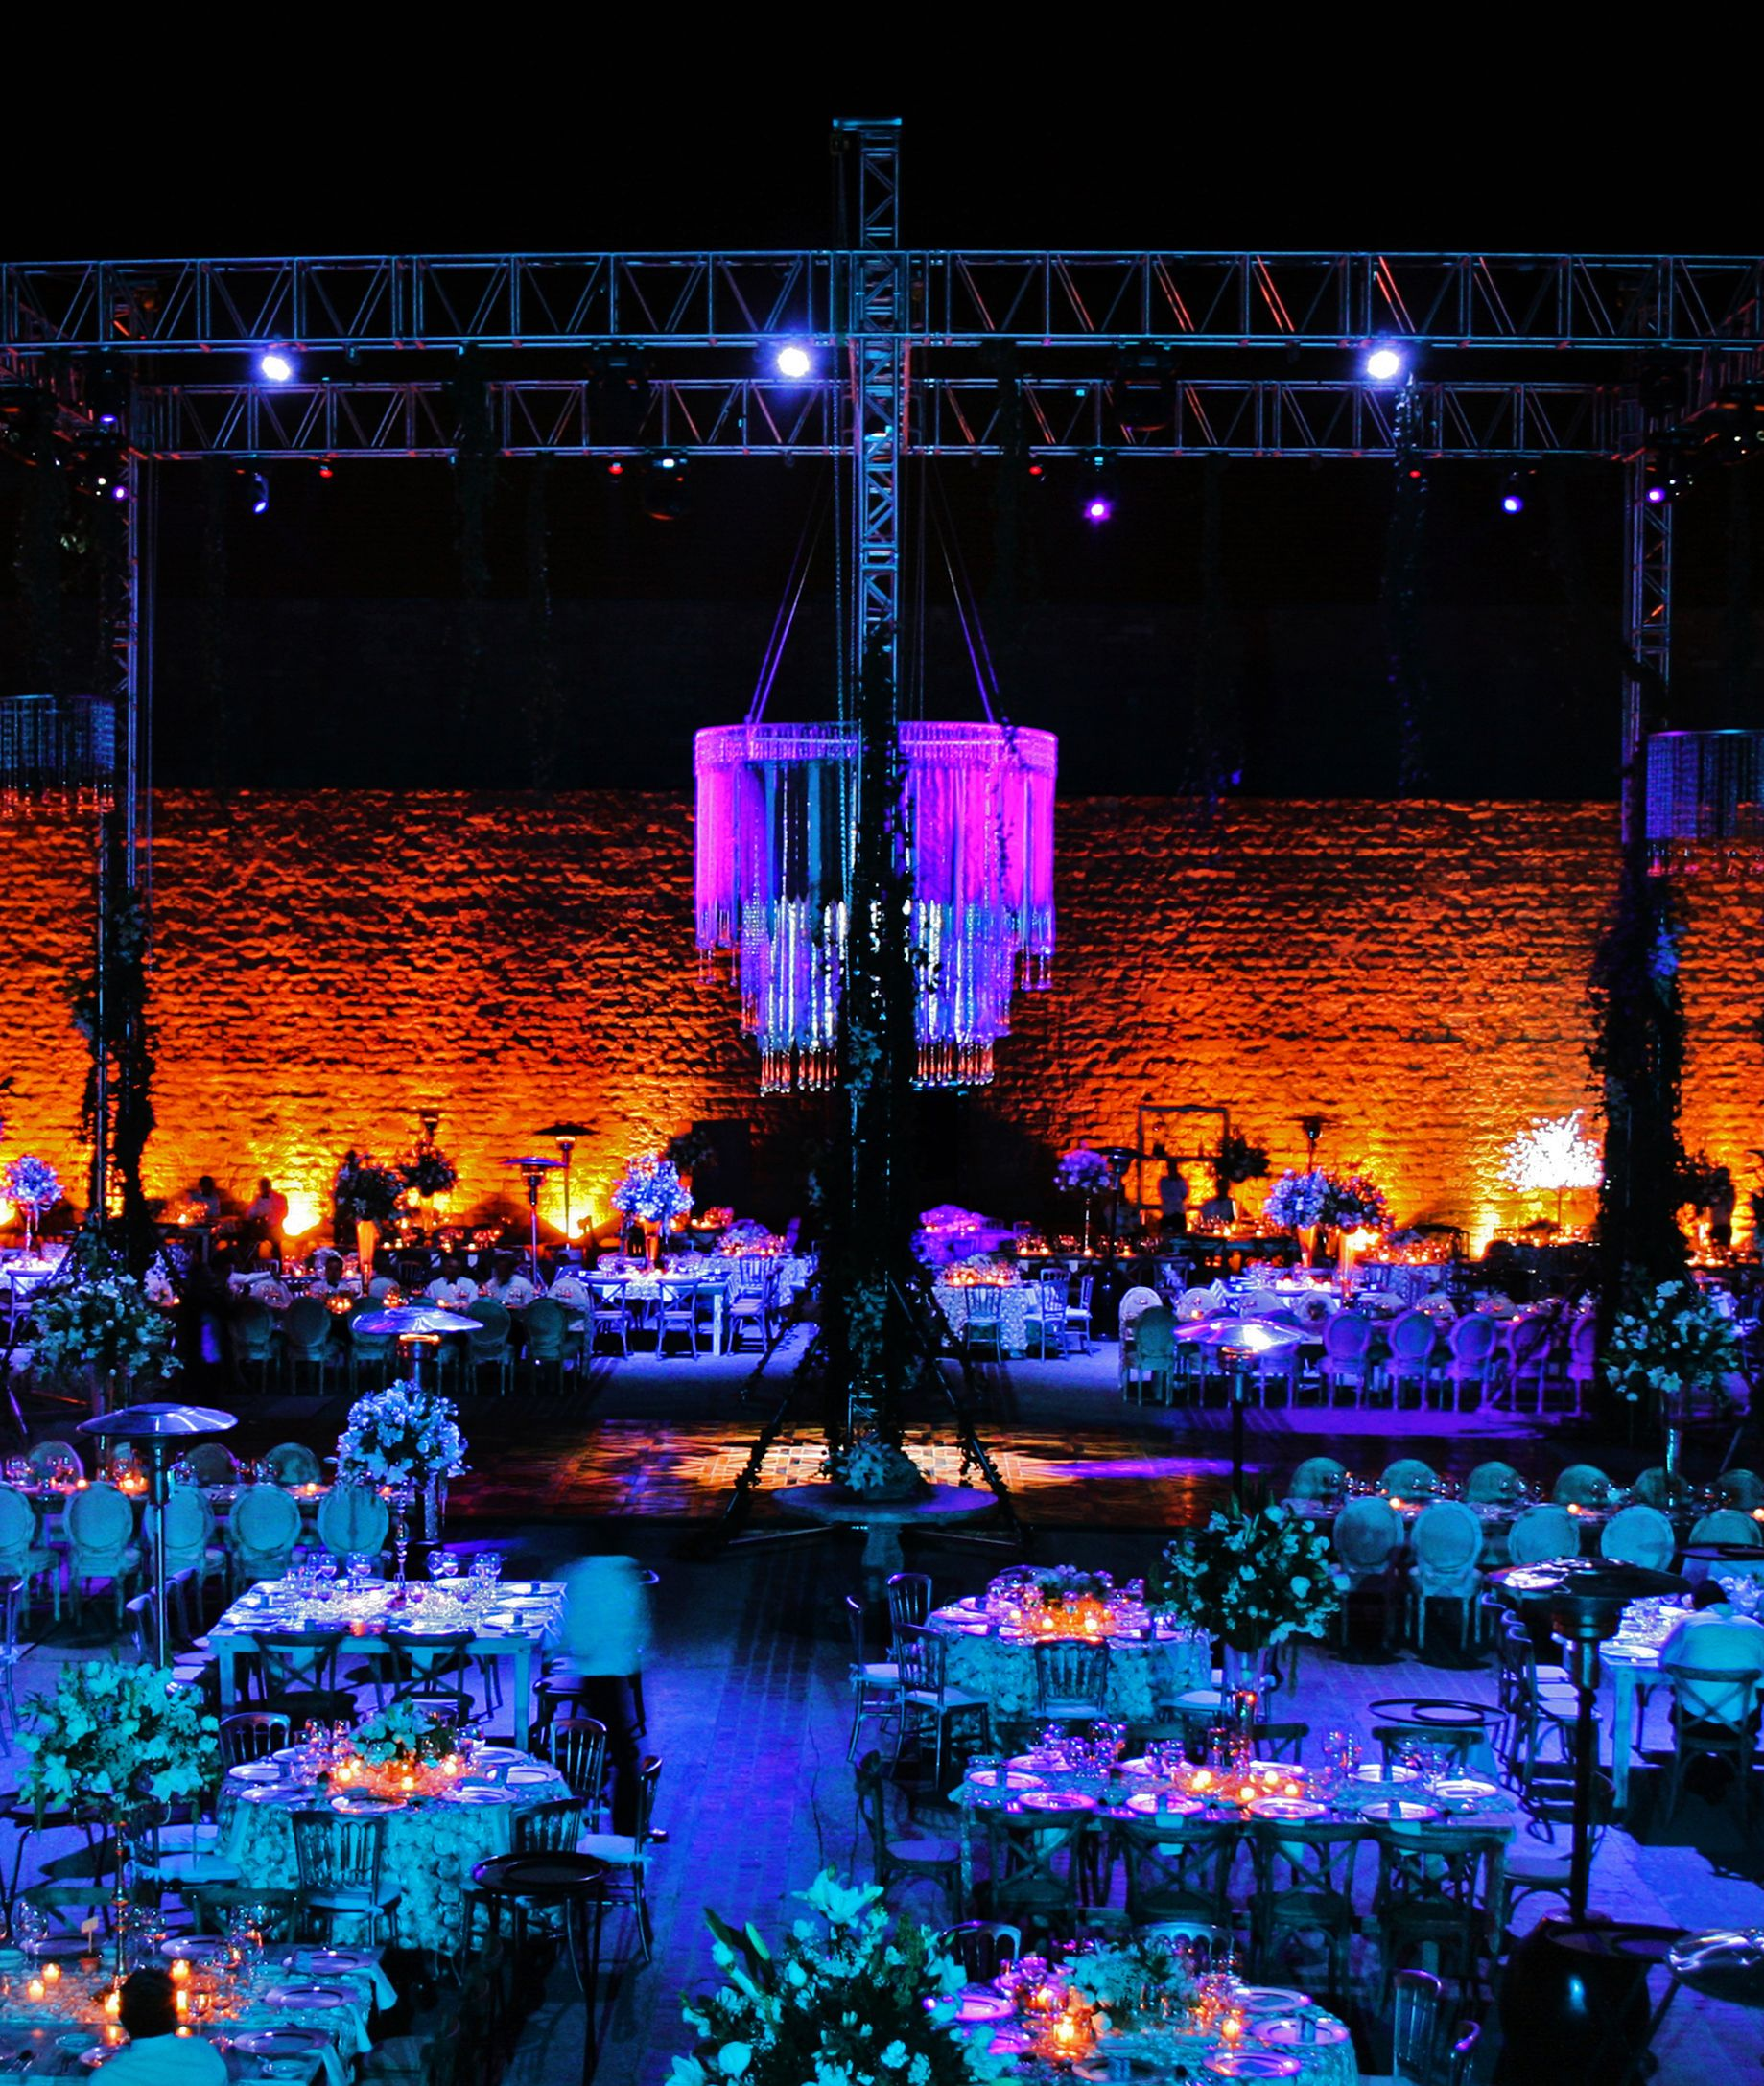 Iluminaci n para boda san luis potos - Iluminacion para plantas ...